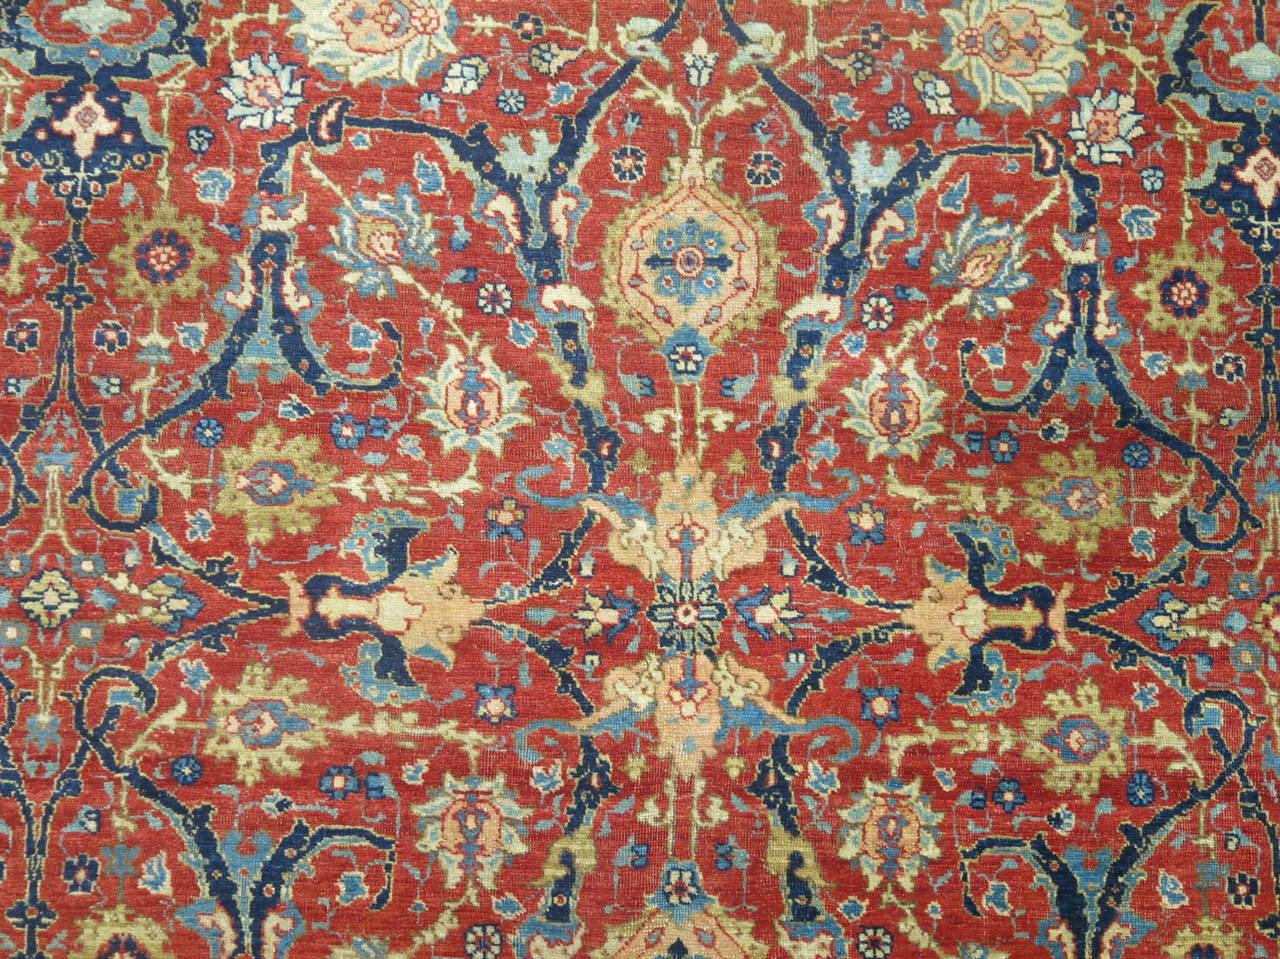 19th Century Antique Persian Tabriz 5